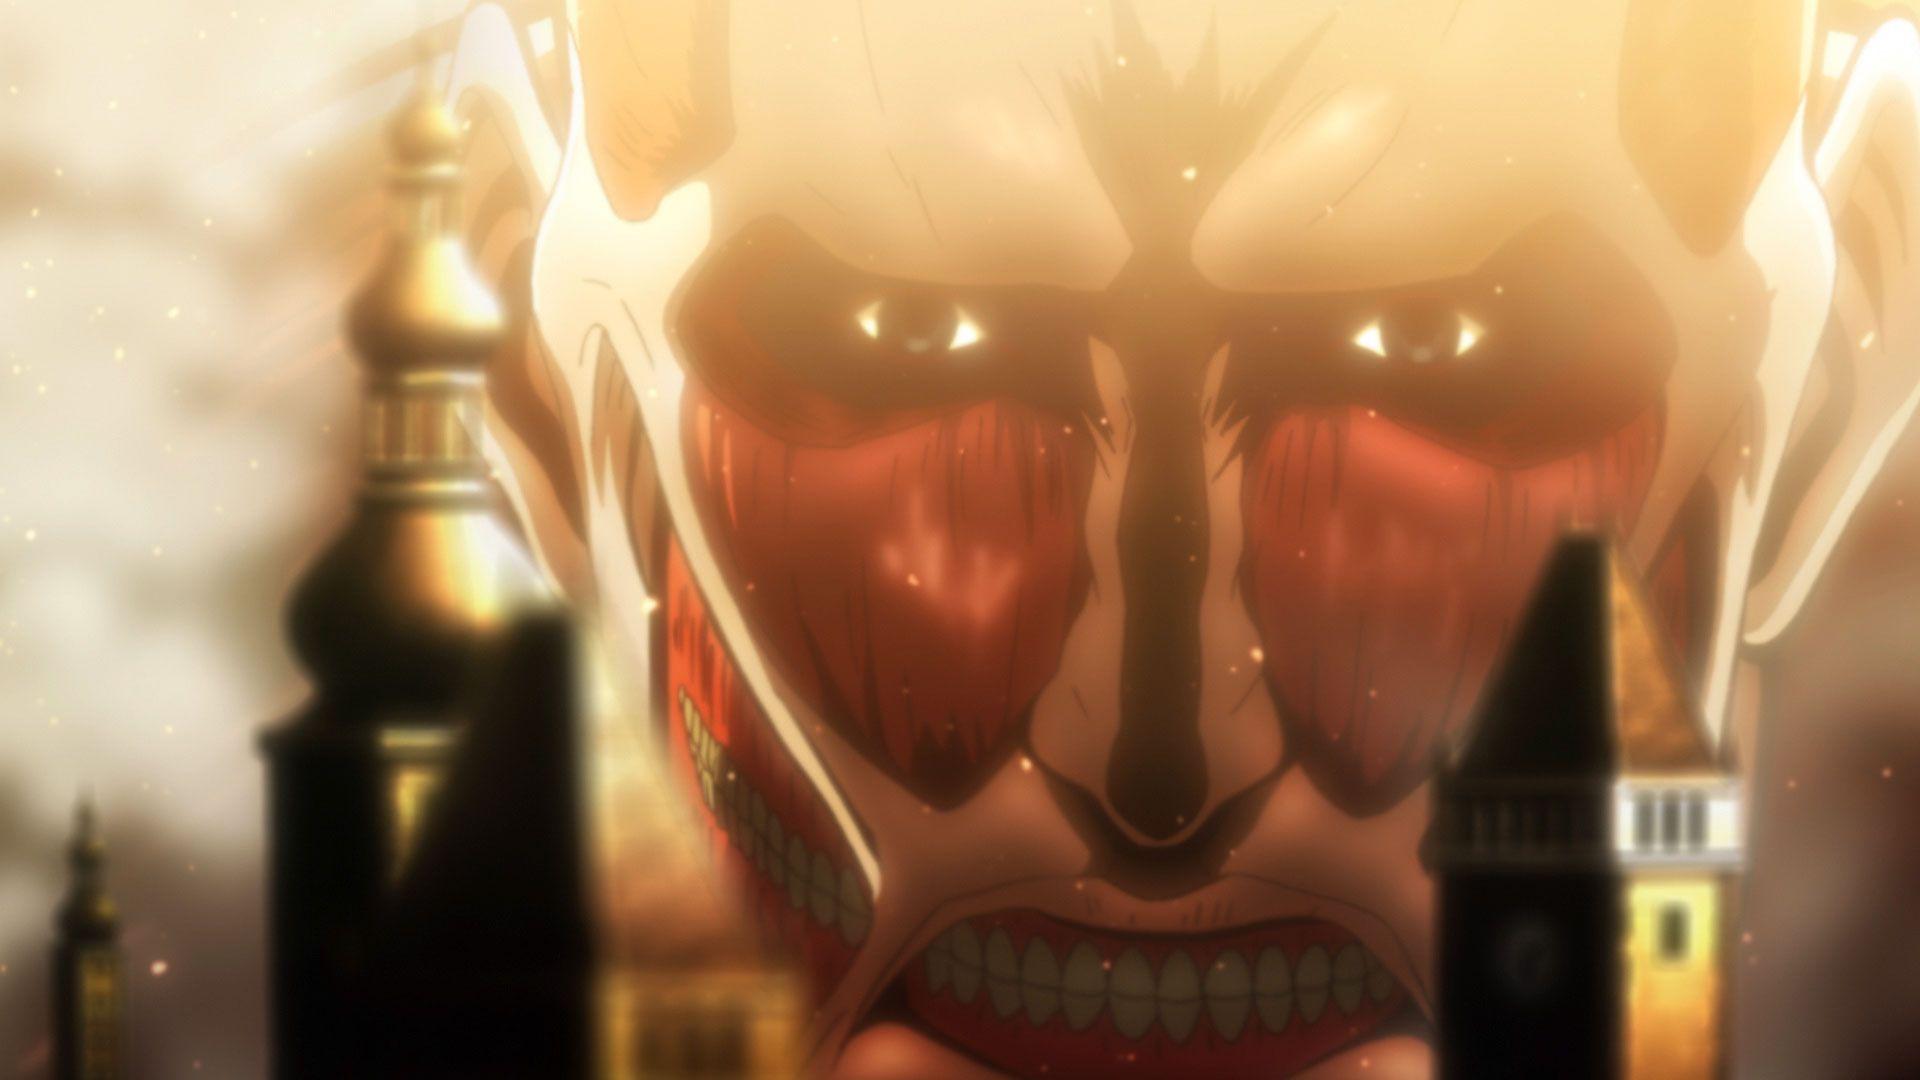 Attack on Titan anime image